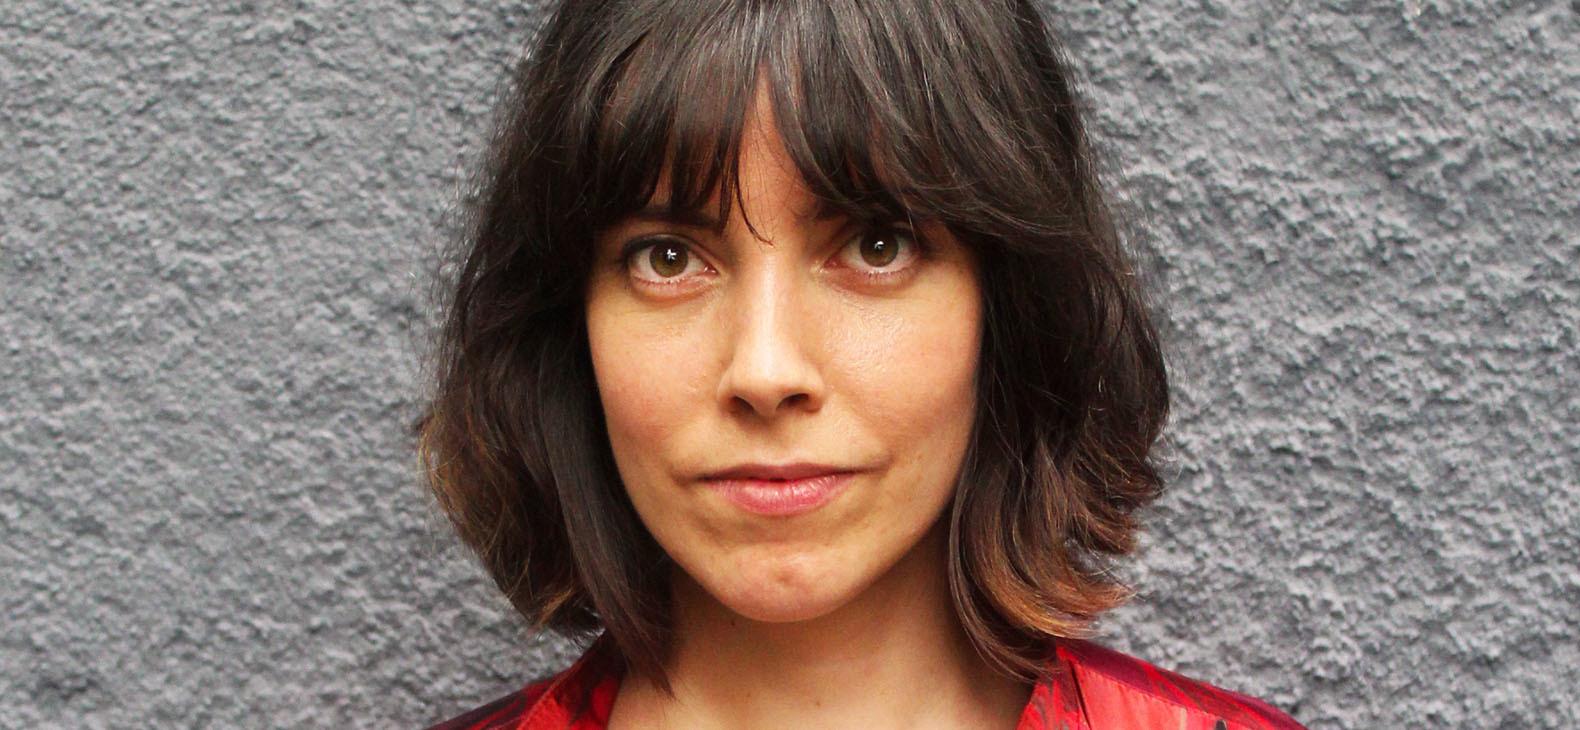 alina martinez portrait